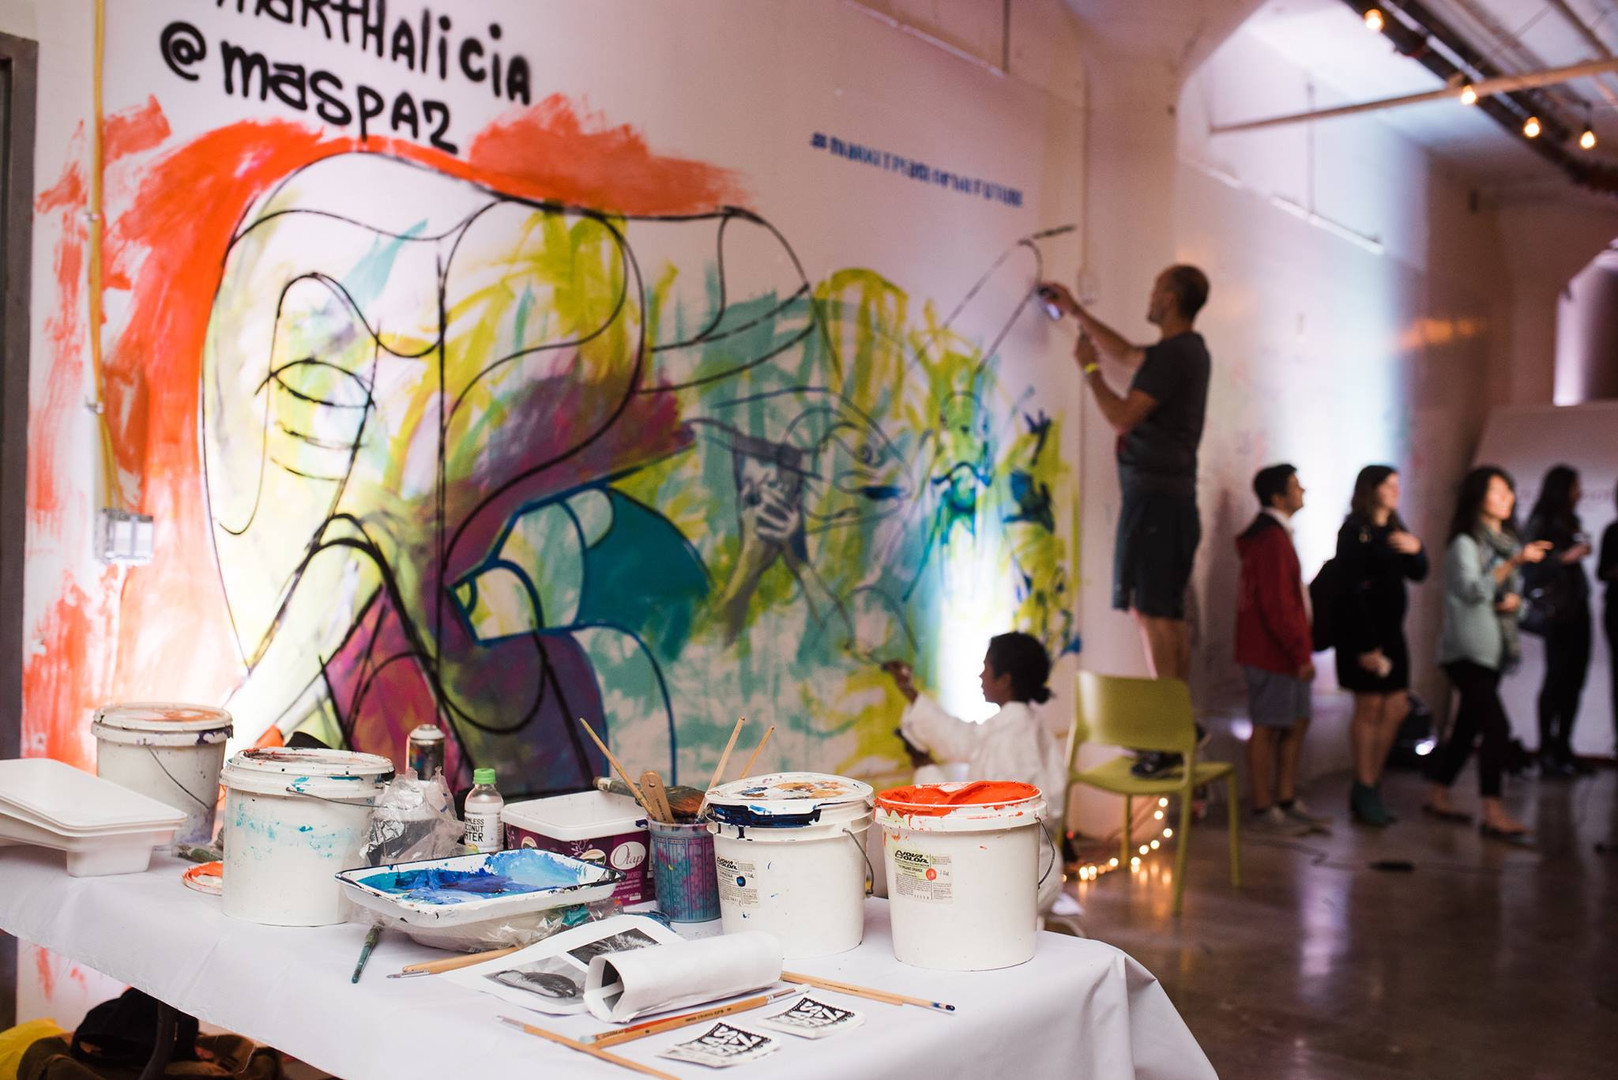 Marthalicia Matarrita Painting at the Marketplace of the Future